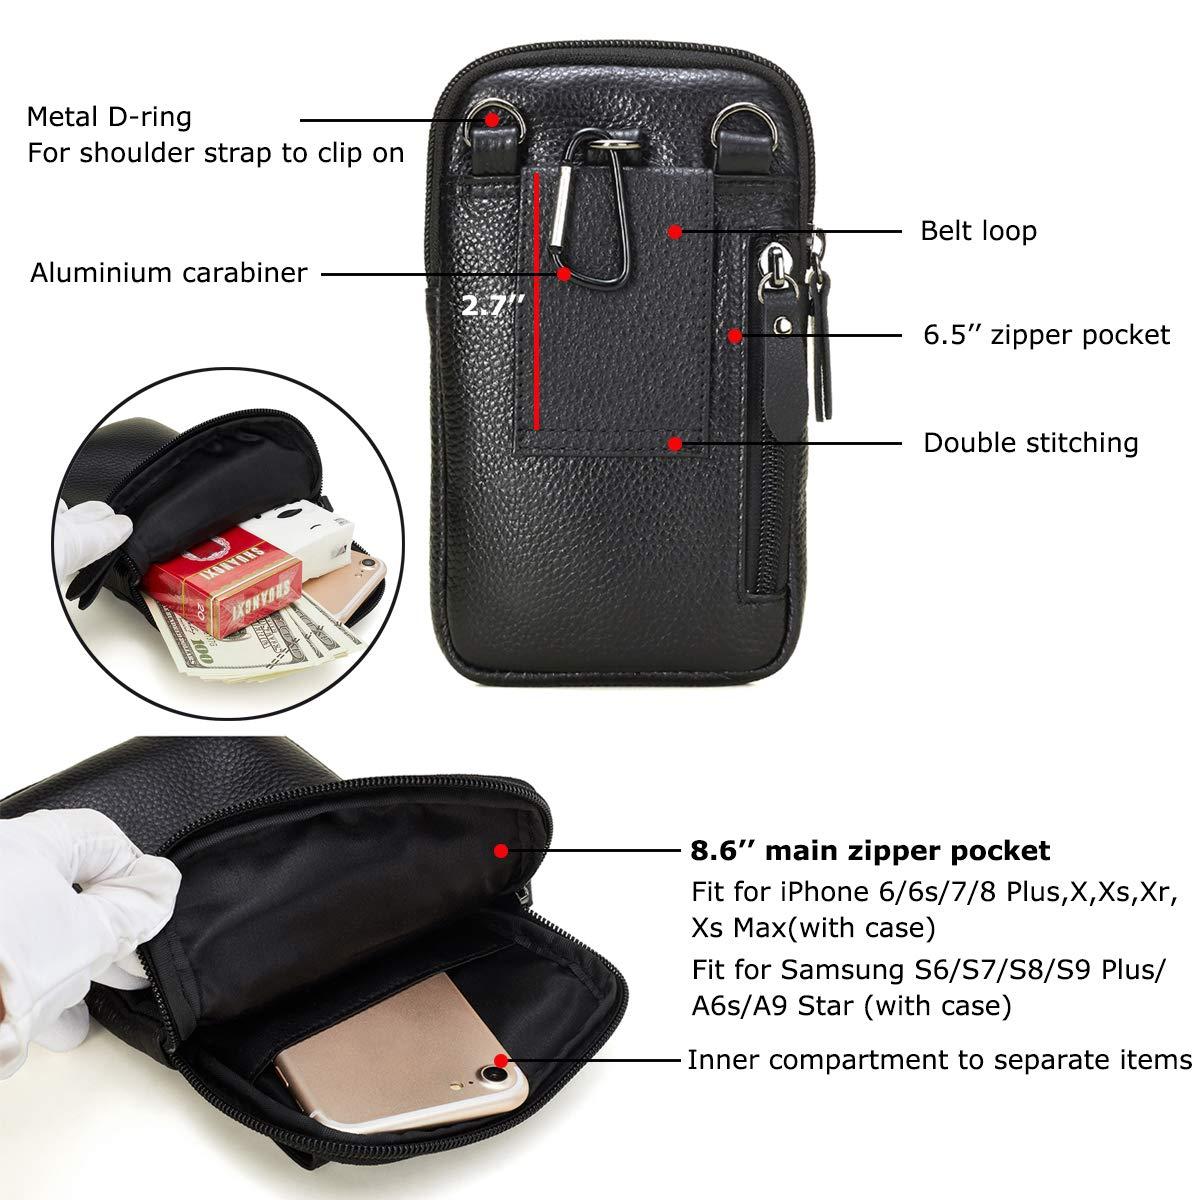 2a88e6dec0f Amazon.com  VIIGER Leather Small Crossbody Travel Purse Crossbody Bag Large  Cell Phone Pouch Belt Holster Mini Shoulder Bag Belt Pouches for Men Belt  Loop ...